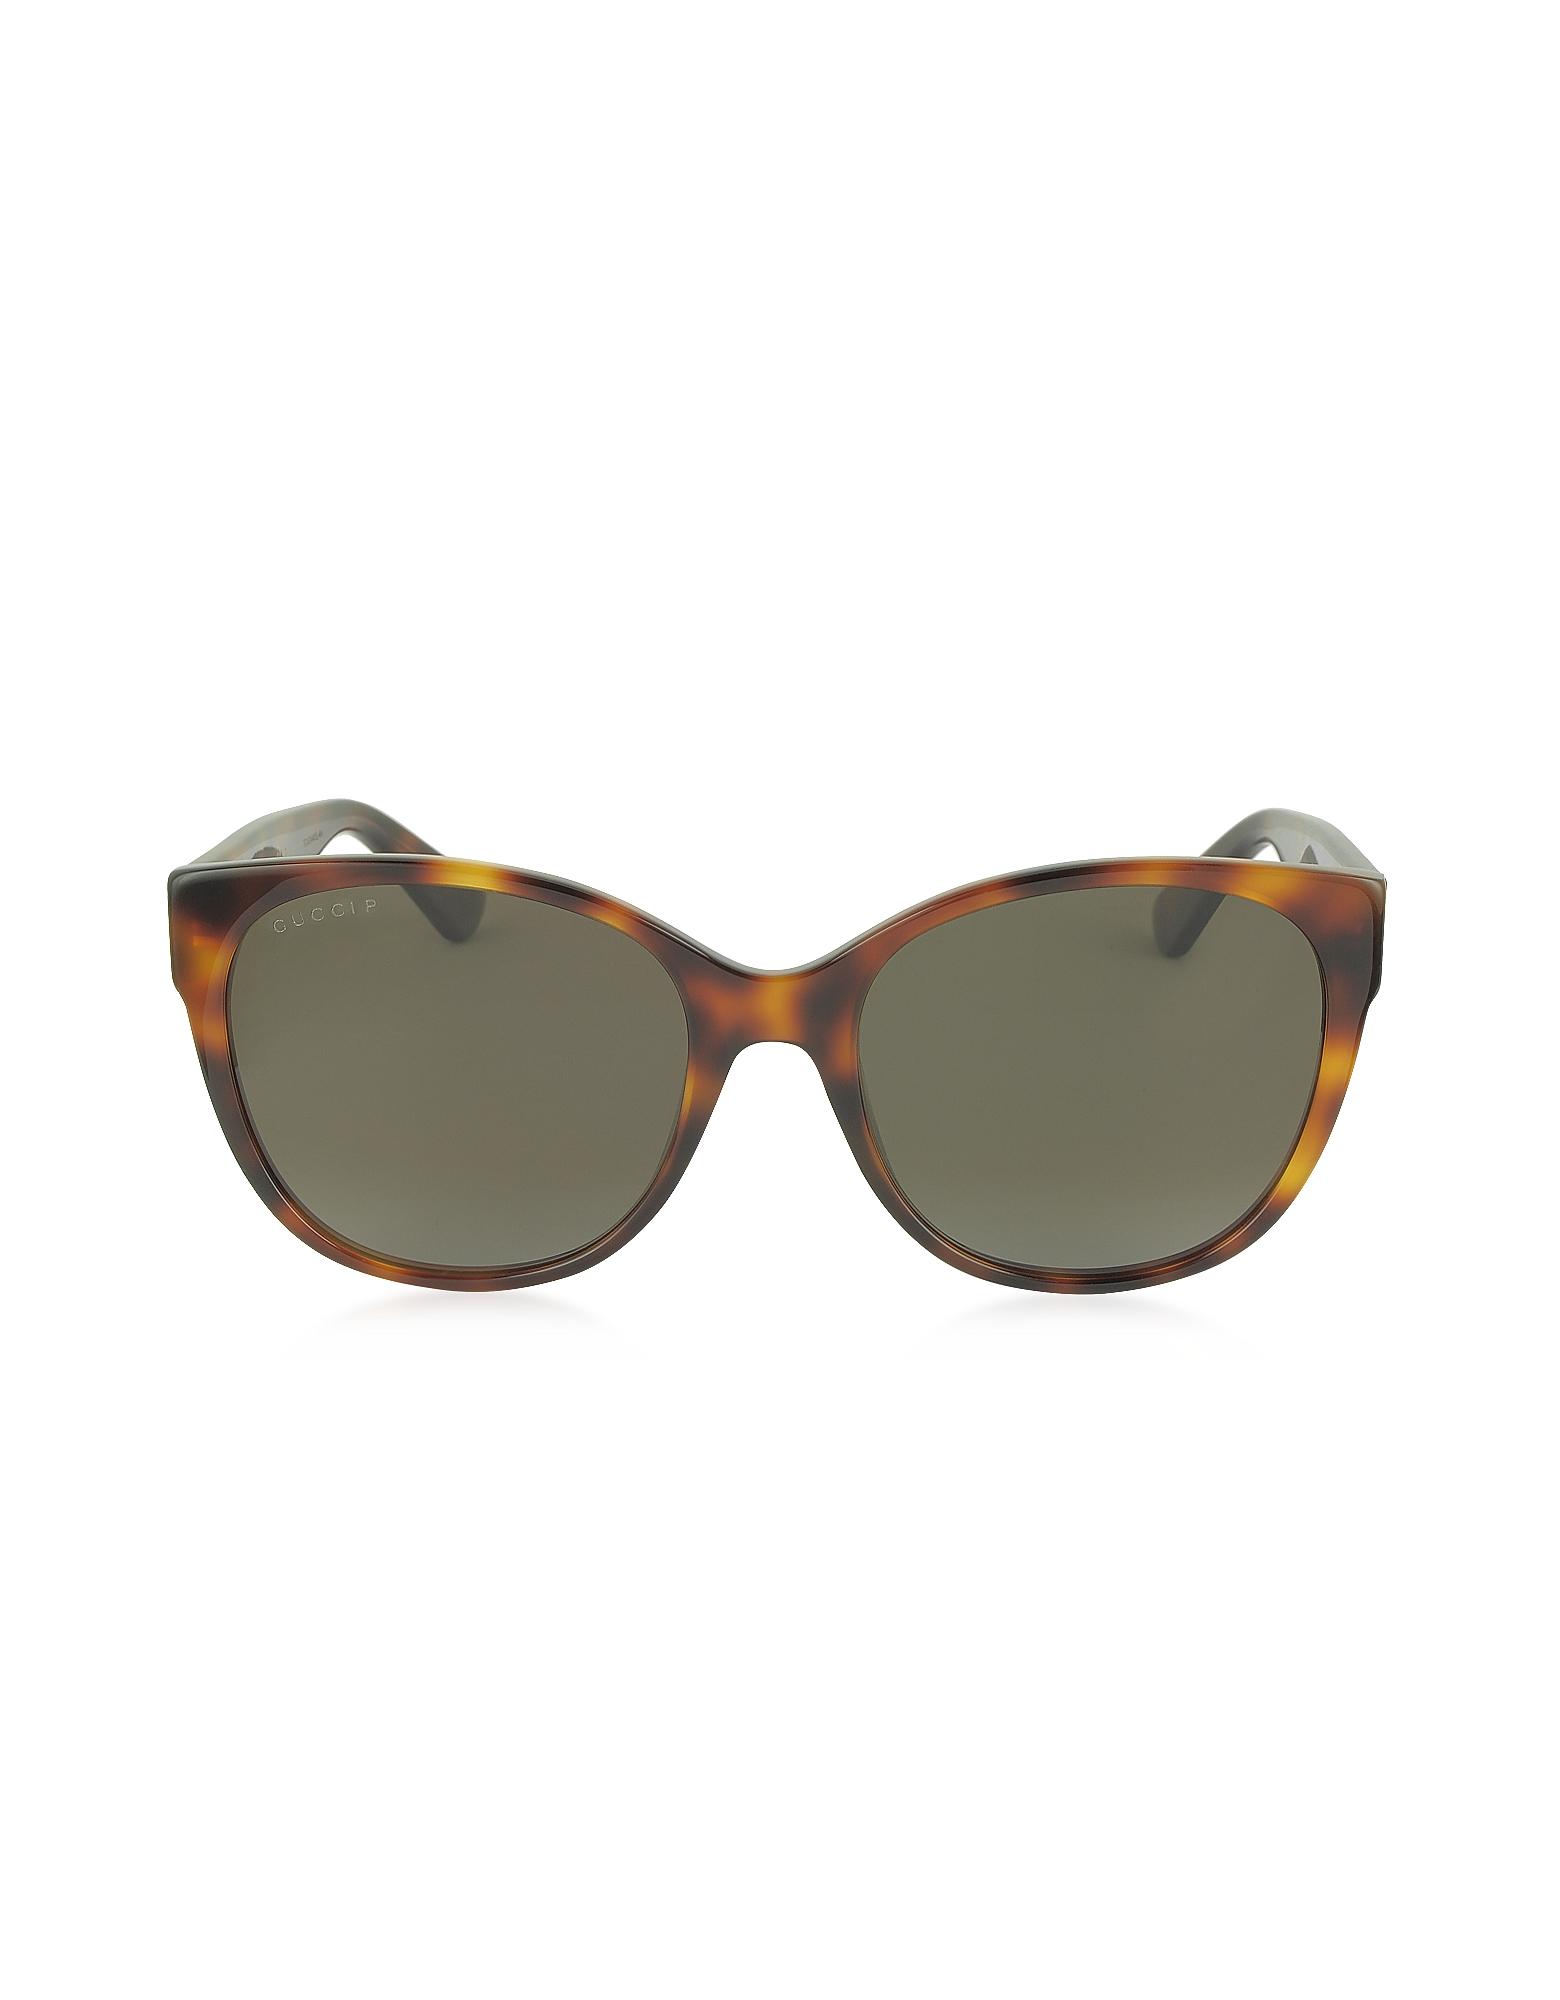 Gucci Designer Sunglasses, GG0097S 006 Havana Acetate Cat Eye Women's Polarized Sunglasses